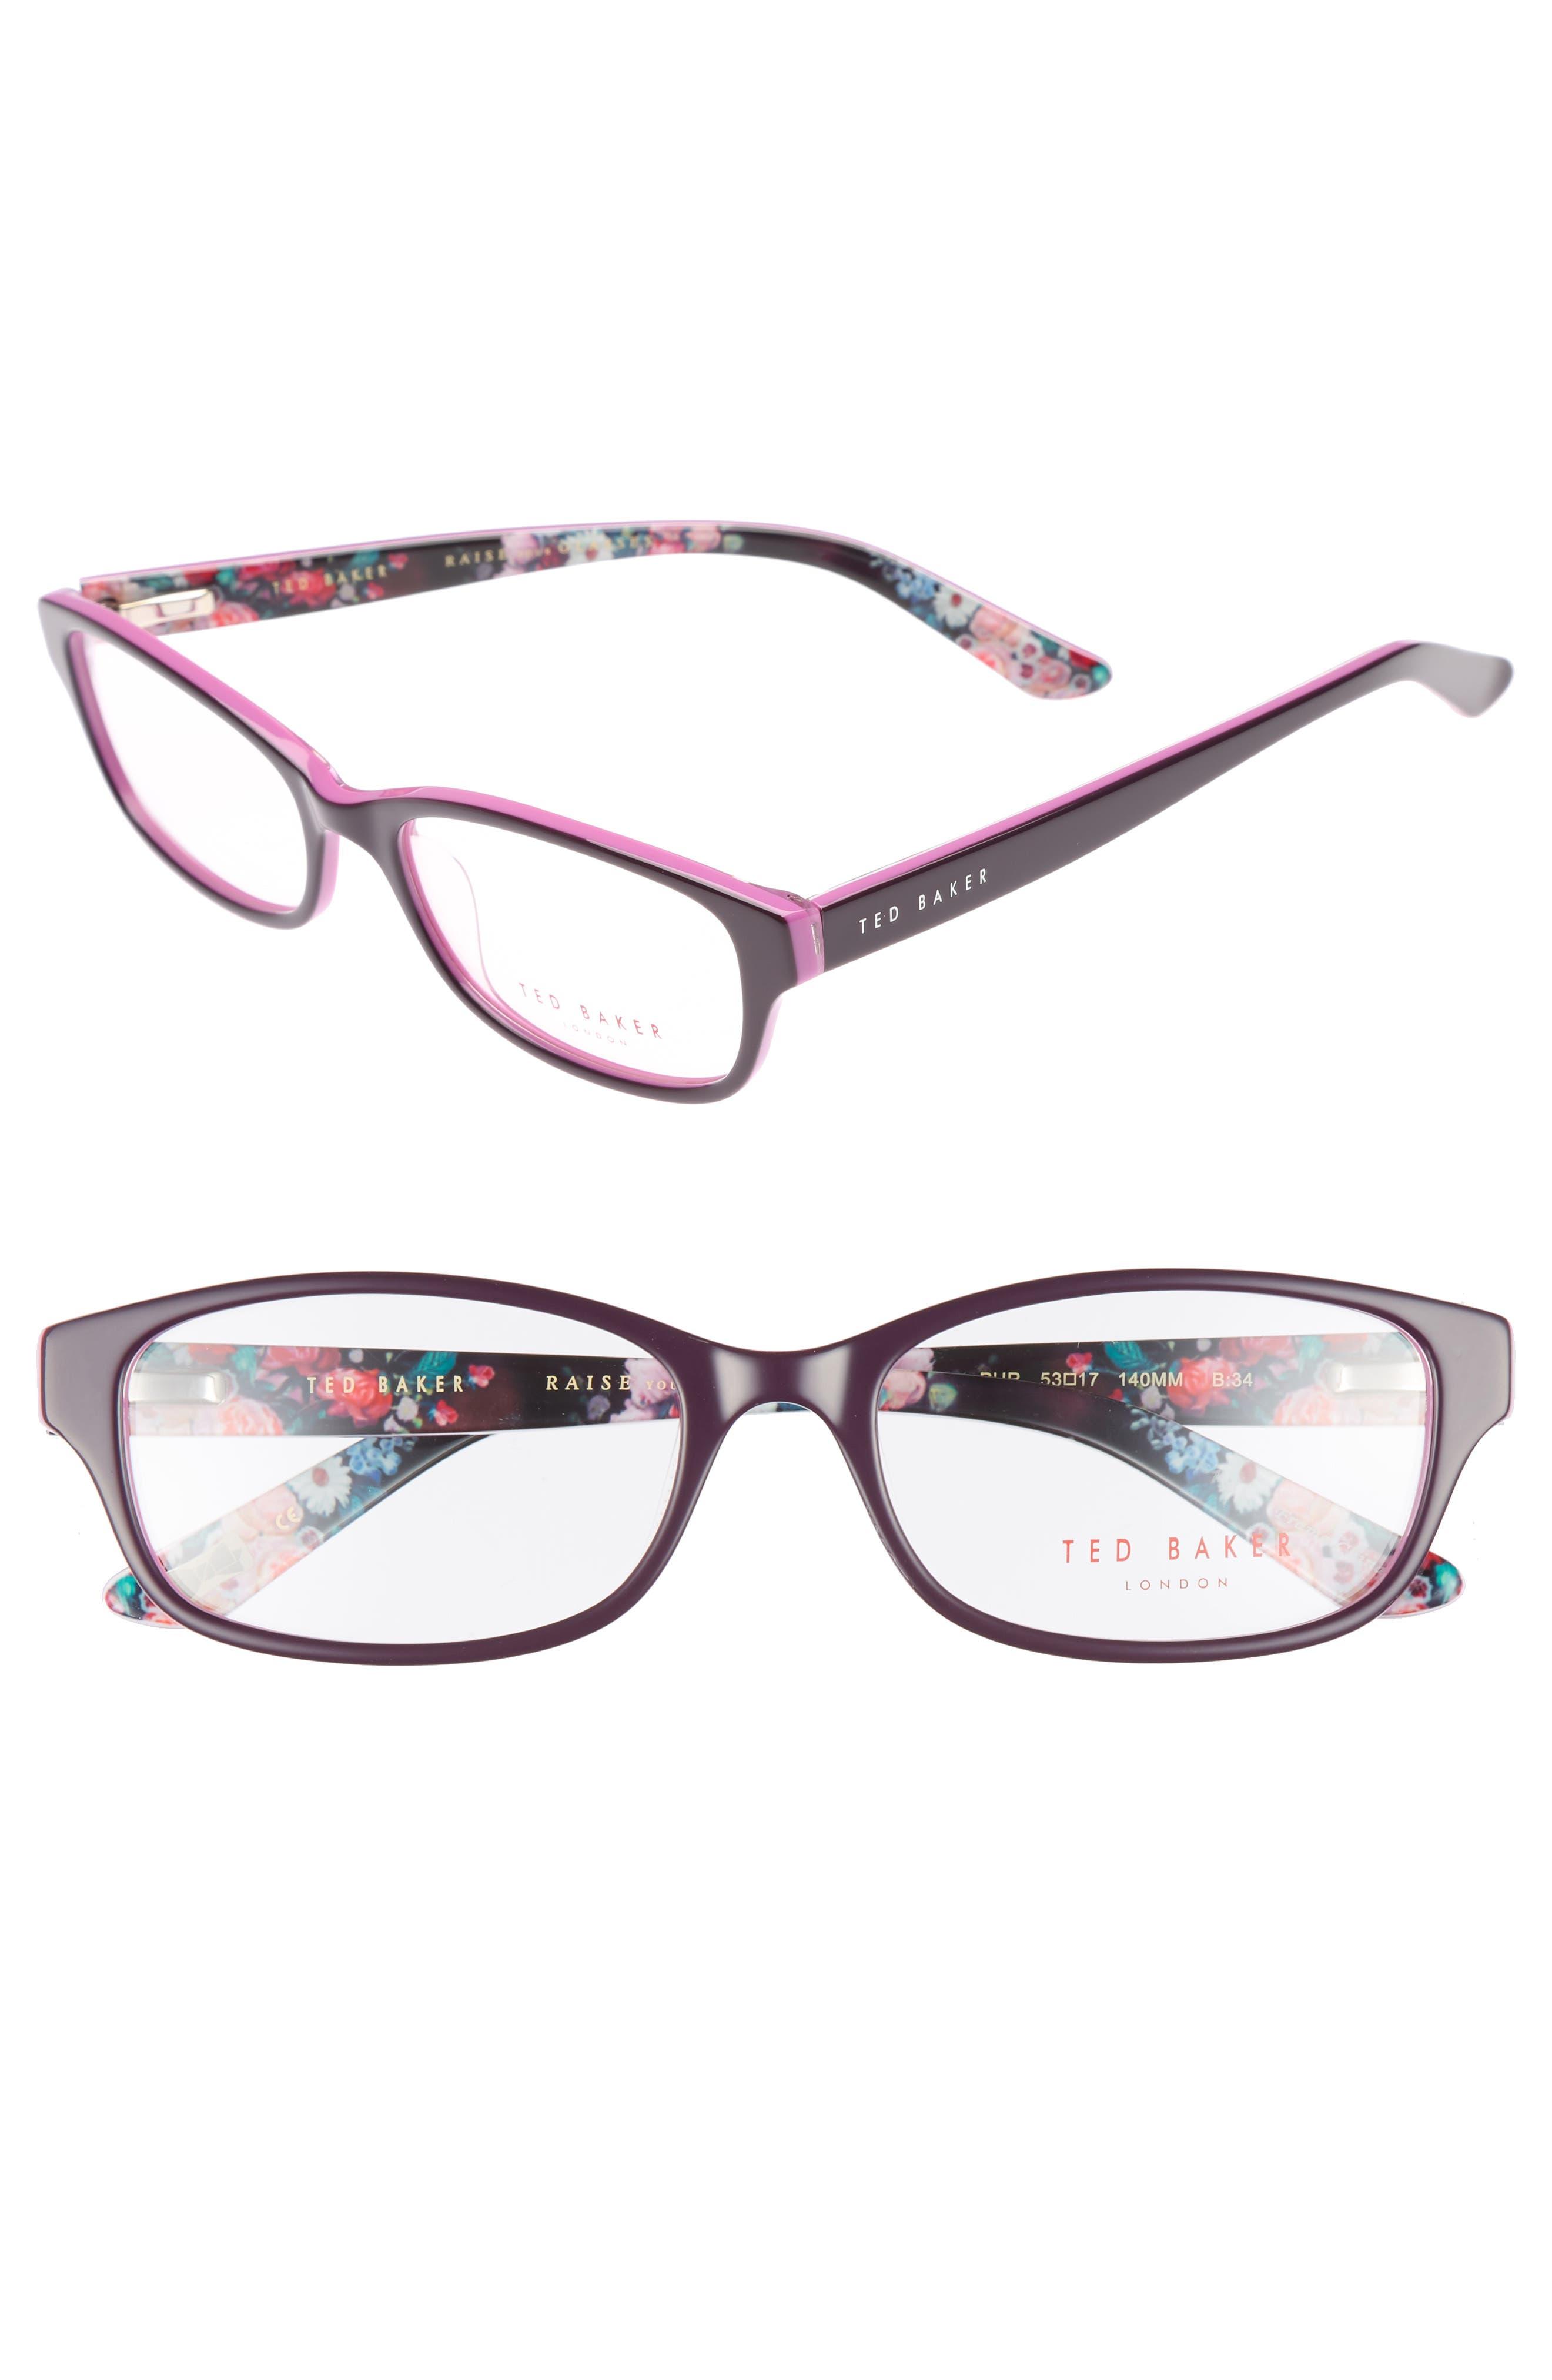 53mm Optical Glasses,                             Main thumbnail 1, color,                             Purple